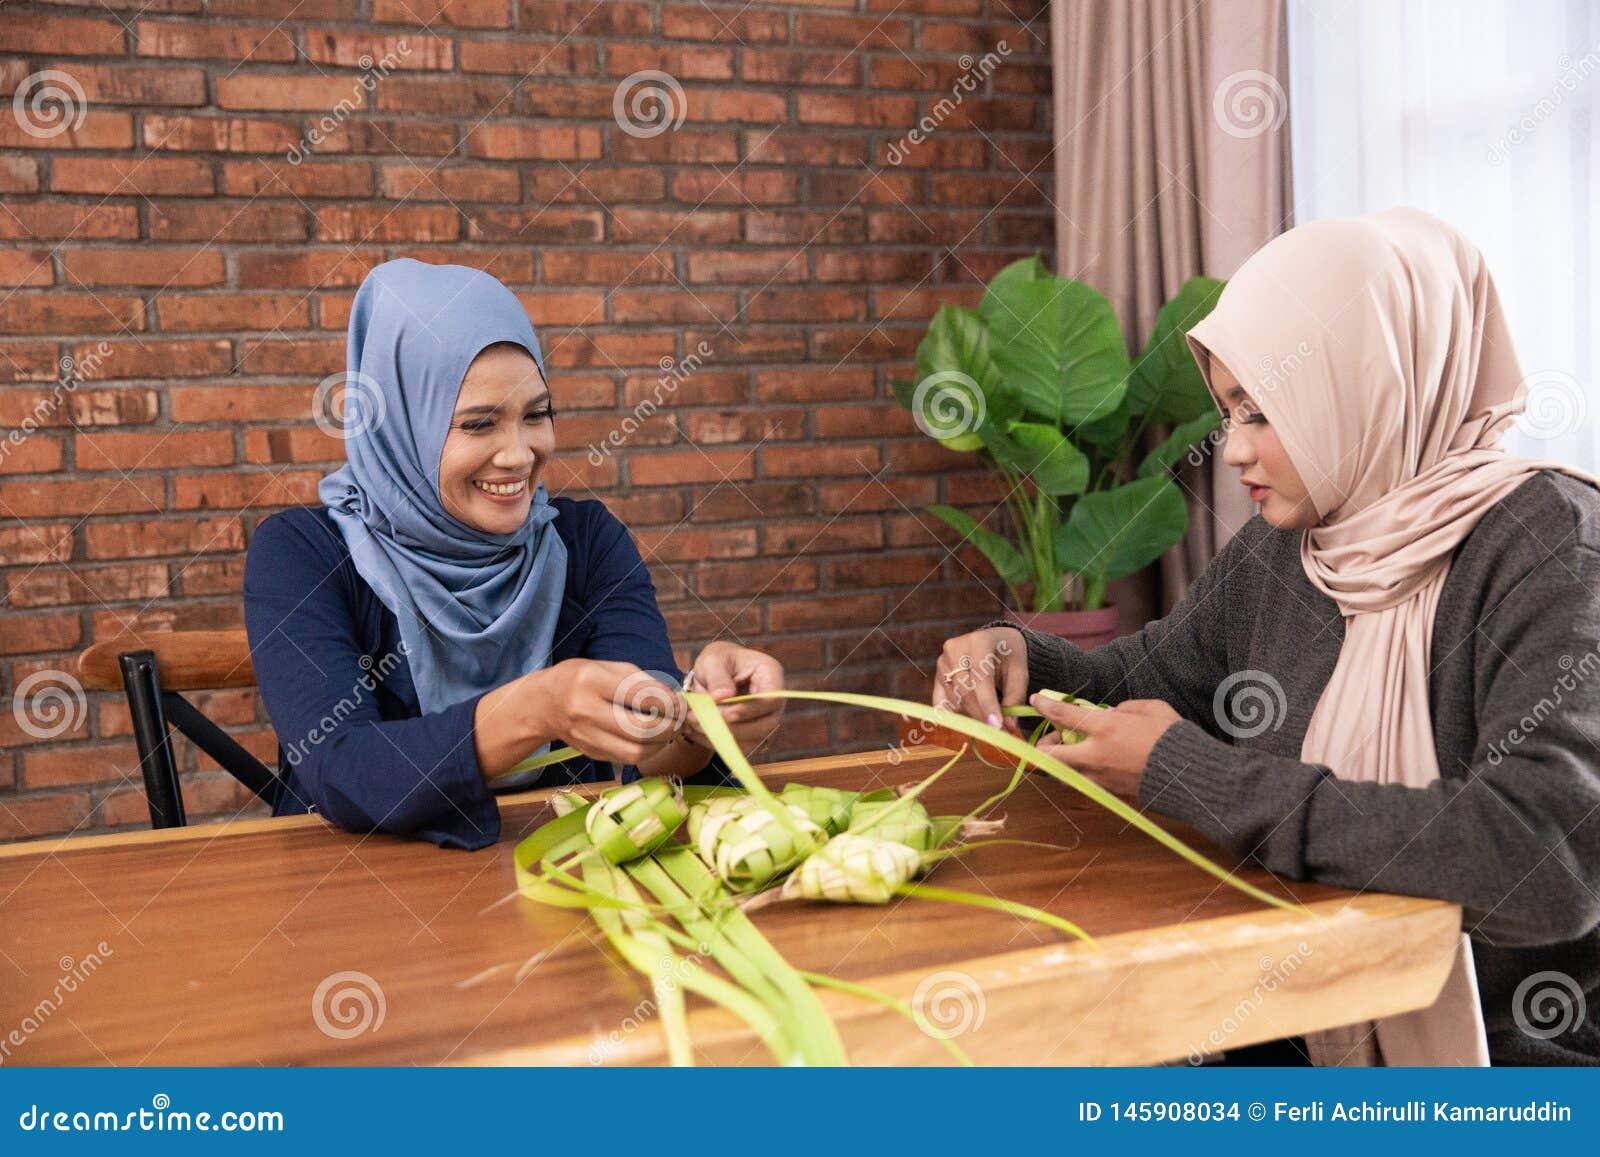 Making ketupat traditional indonesian food together